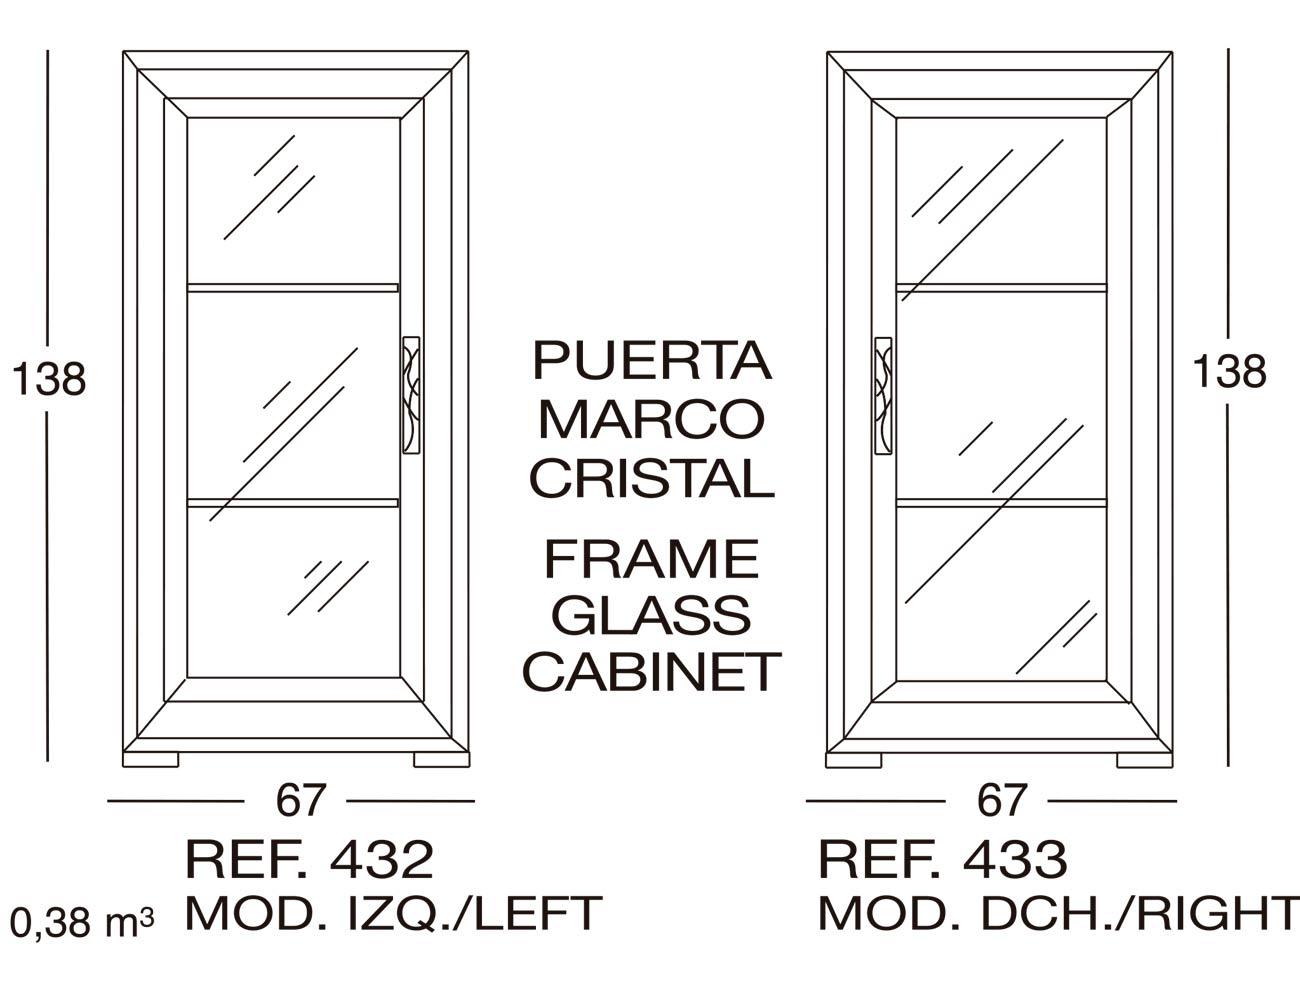 Modulo izdo puerta marco cristal 432